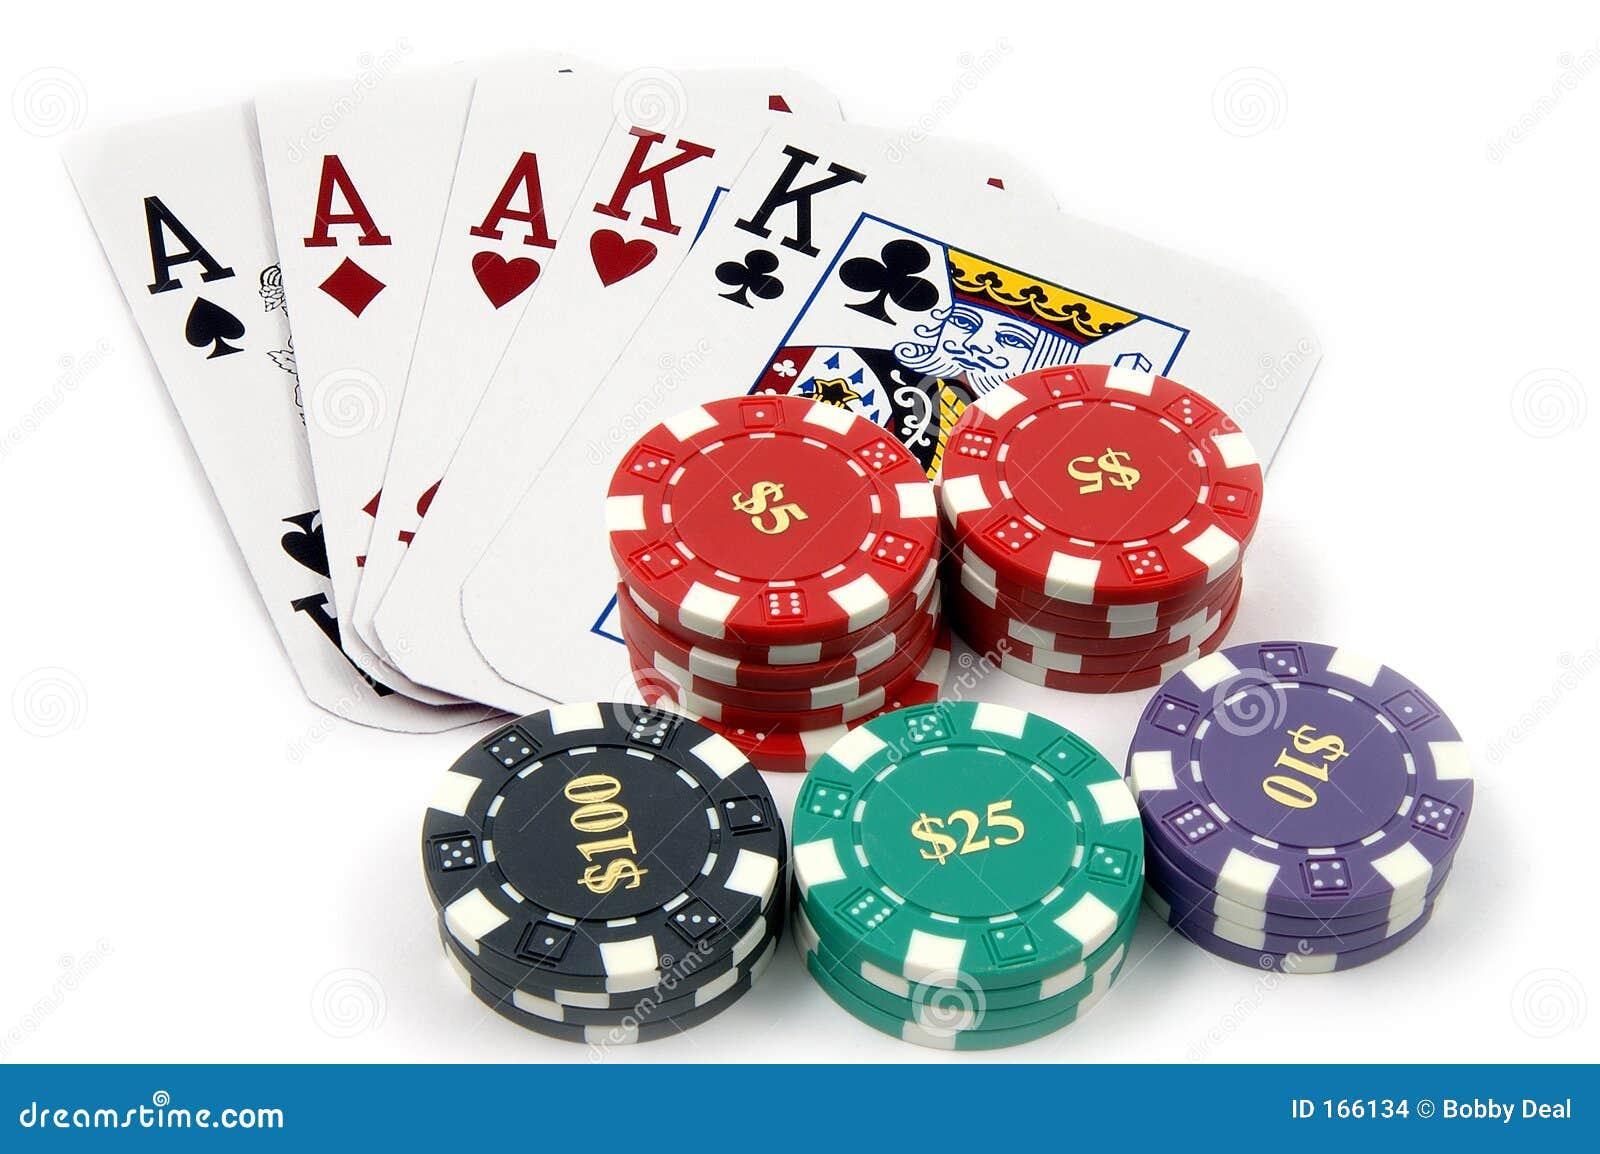 aces full of kings poker sports